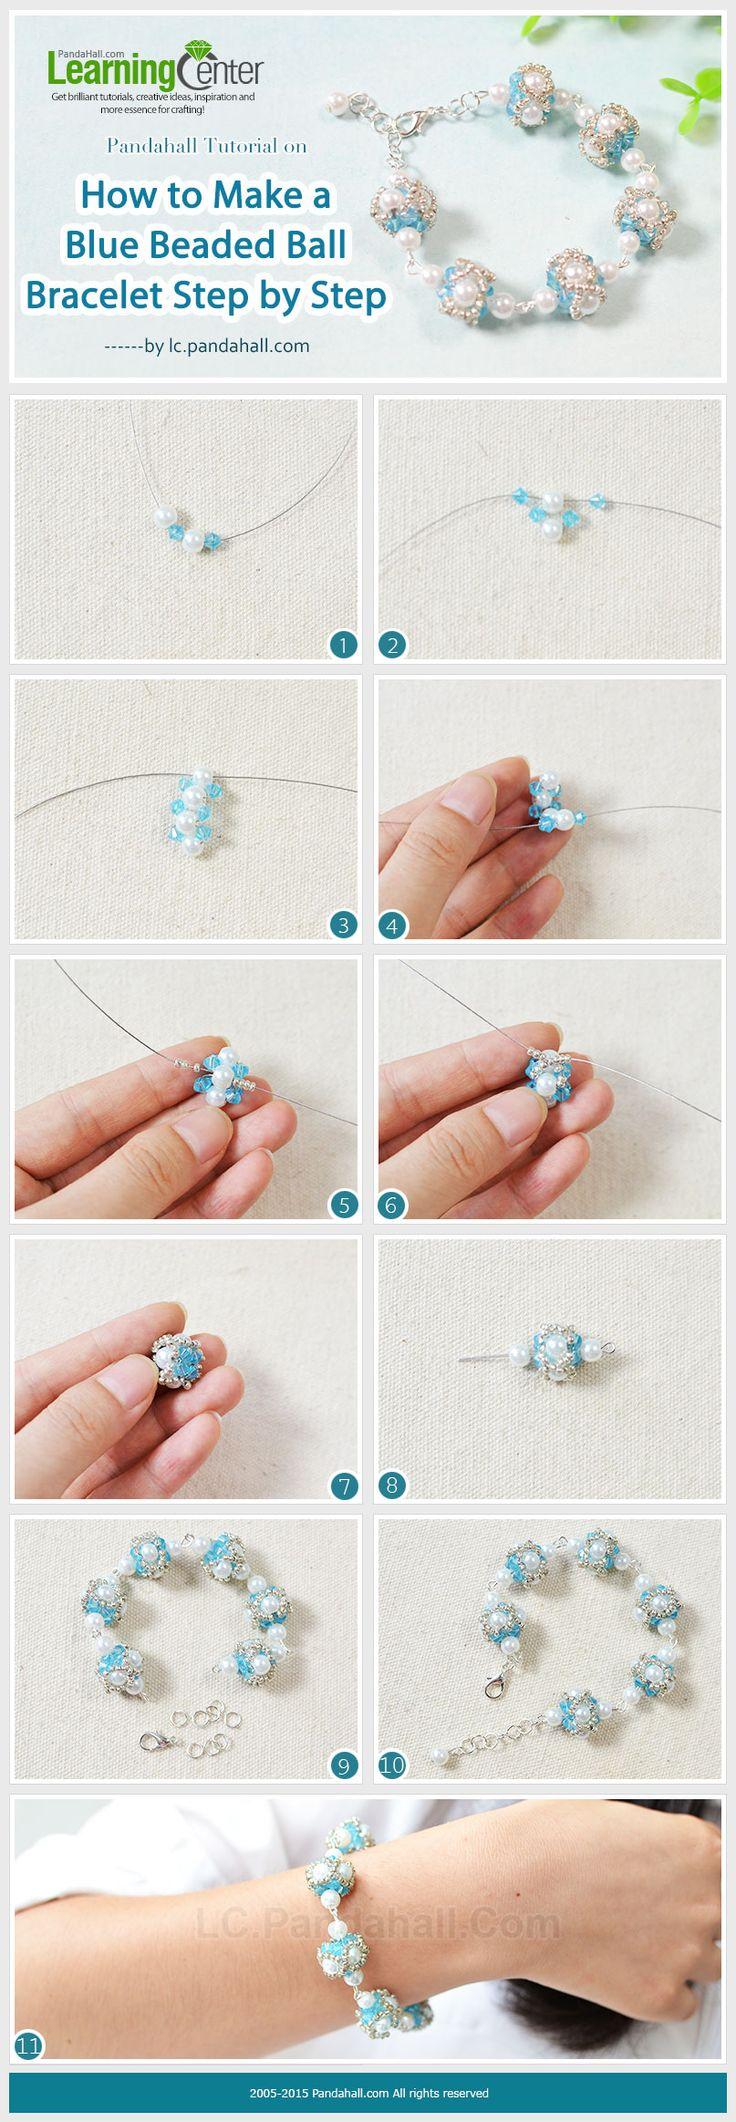 Pandahall Tutorial on How to Make a Blue Beaded Ball Bracelet Step by Step